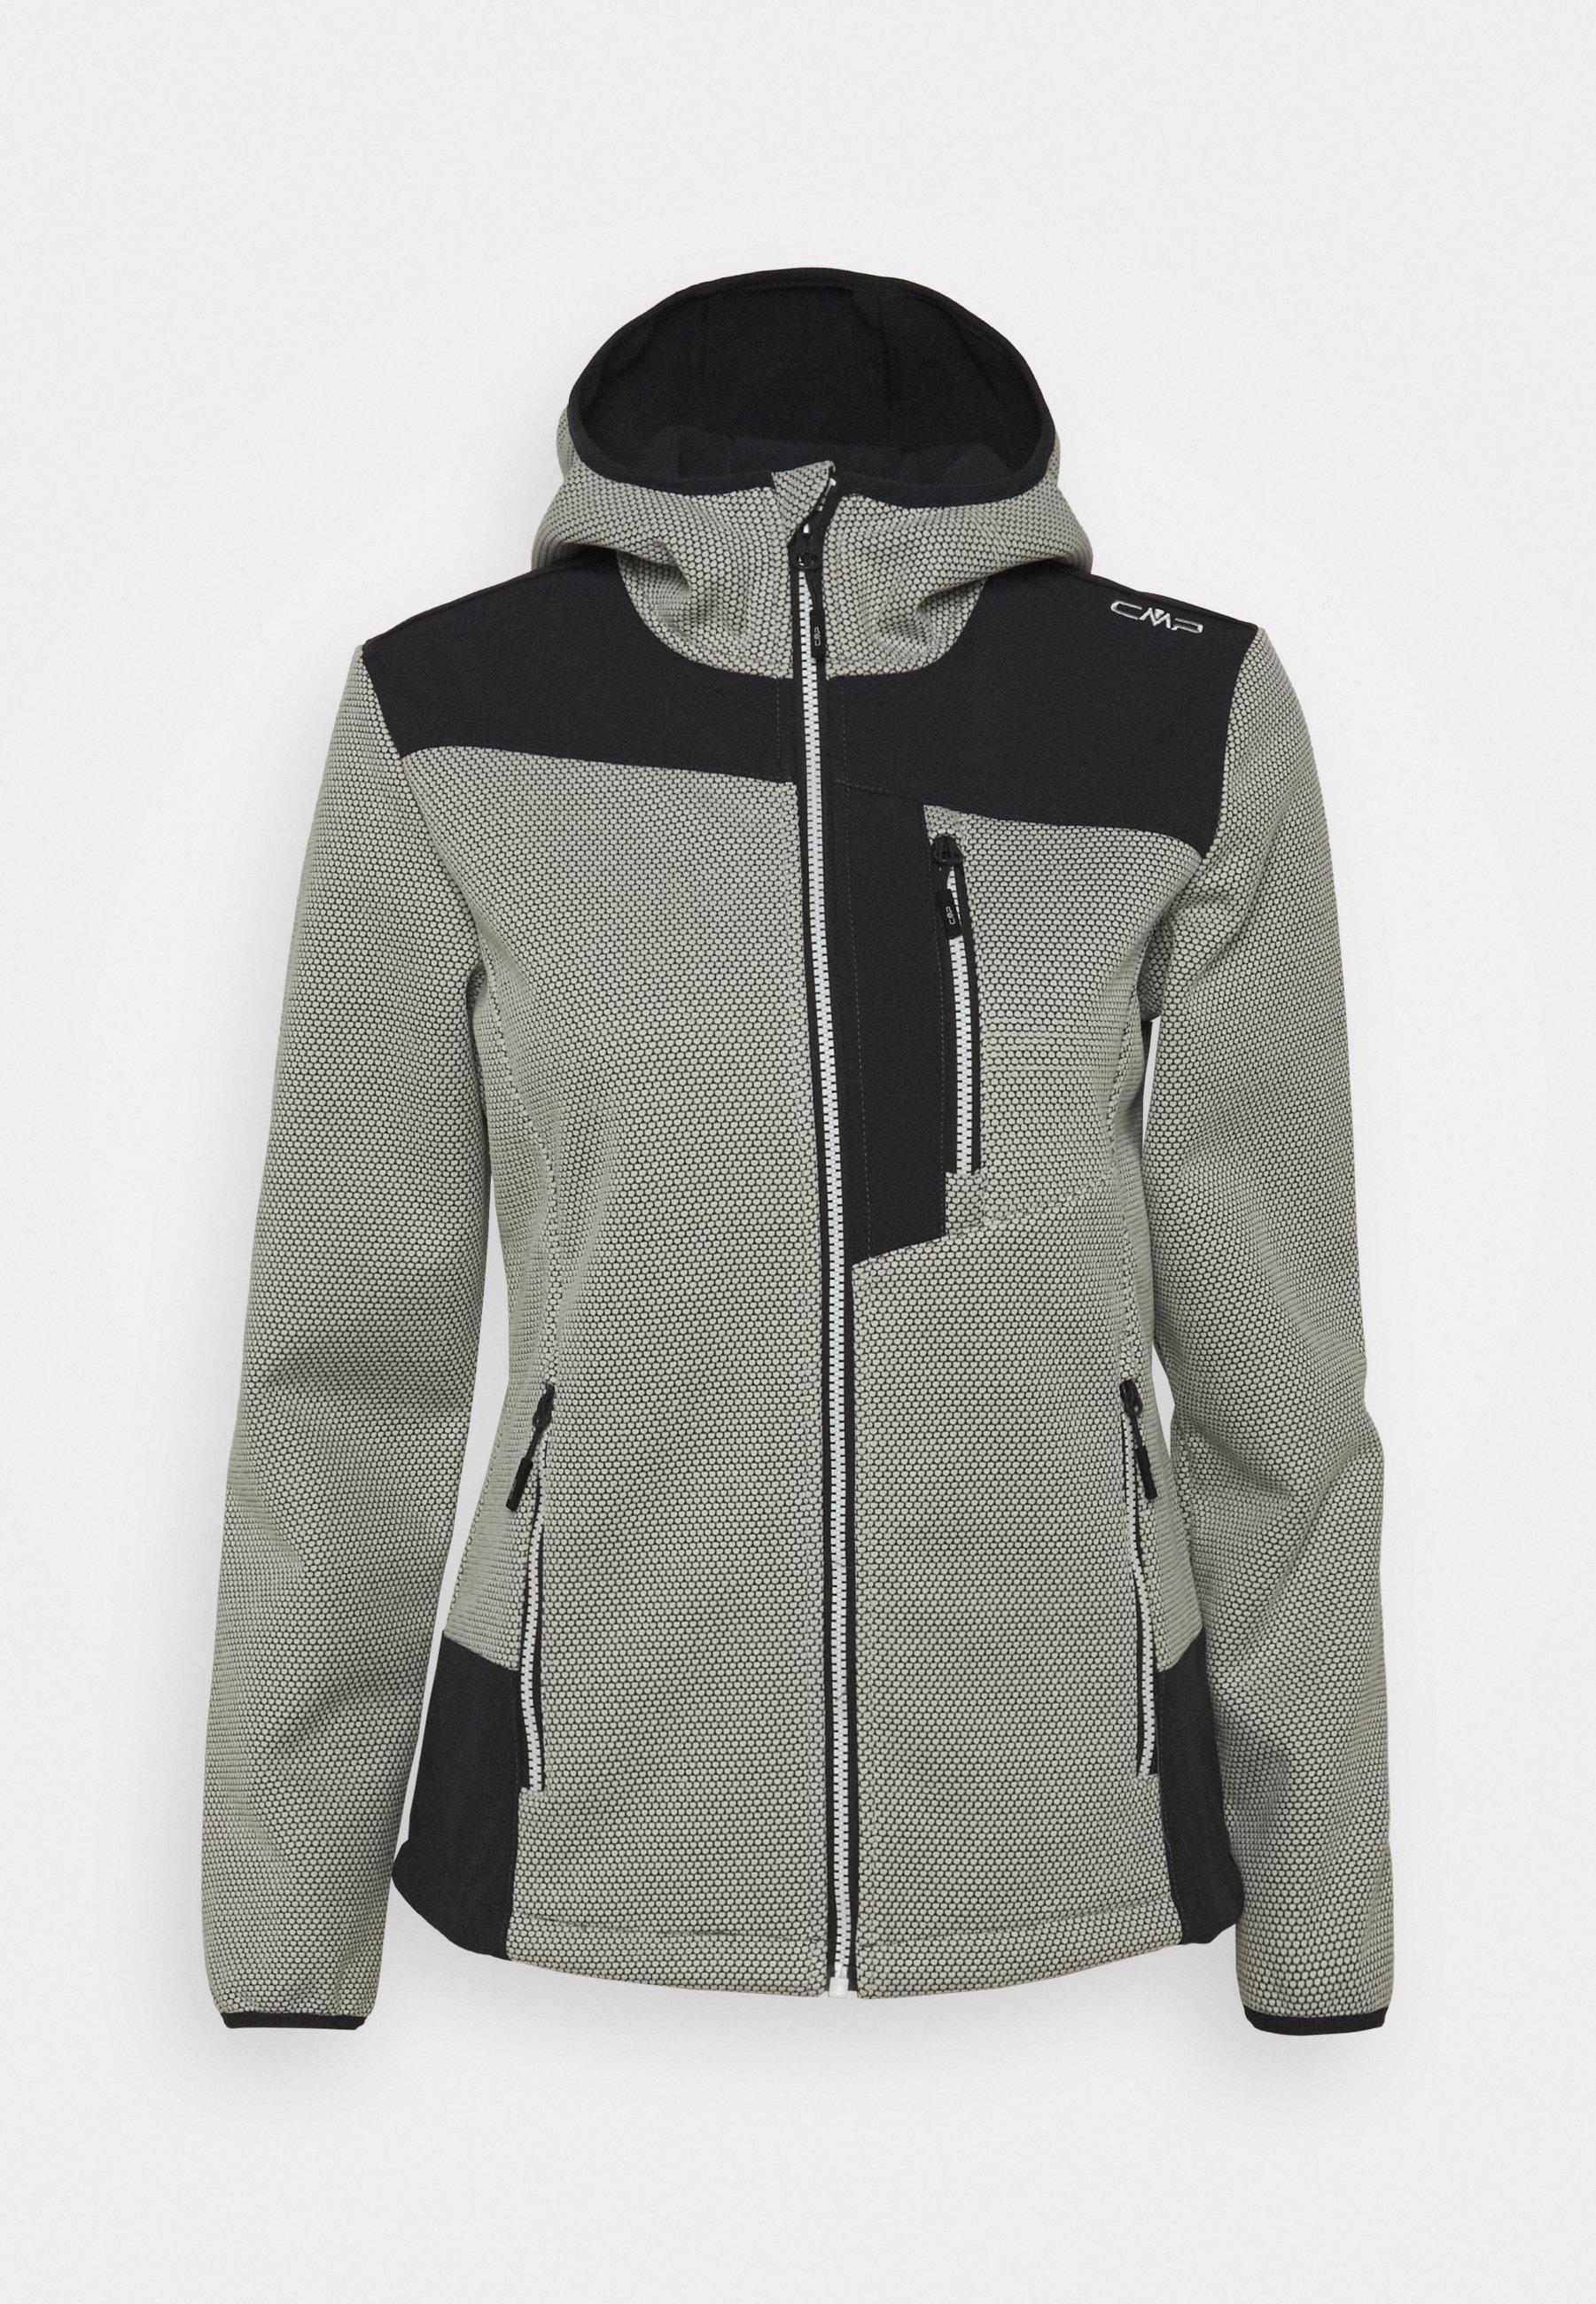 CMP Outdoorjacke Jacke WOMAN PARKA FIX HOOD schwarz wasserabweisend atmungsaktiv